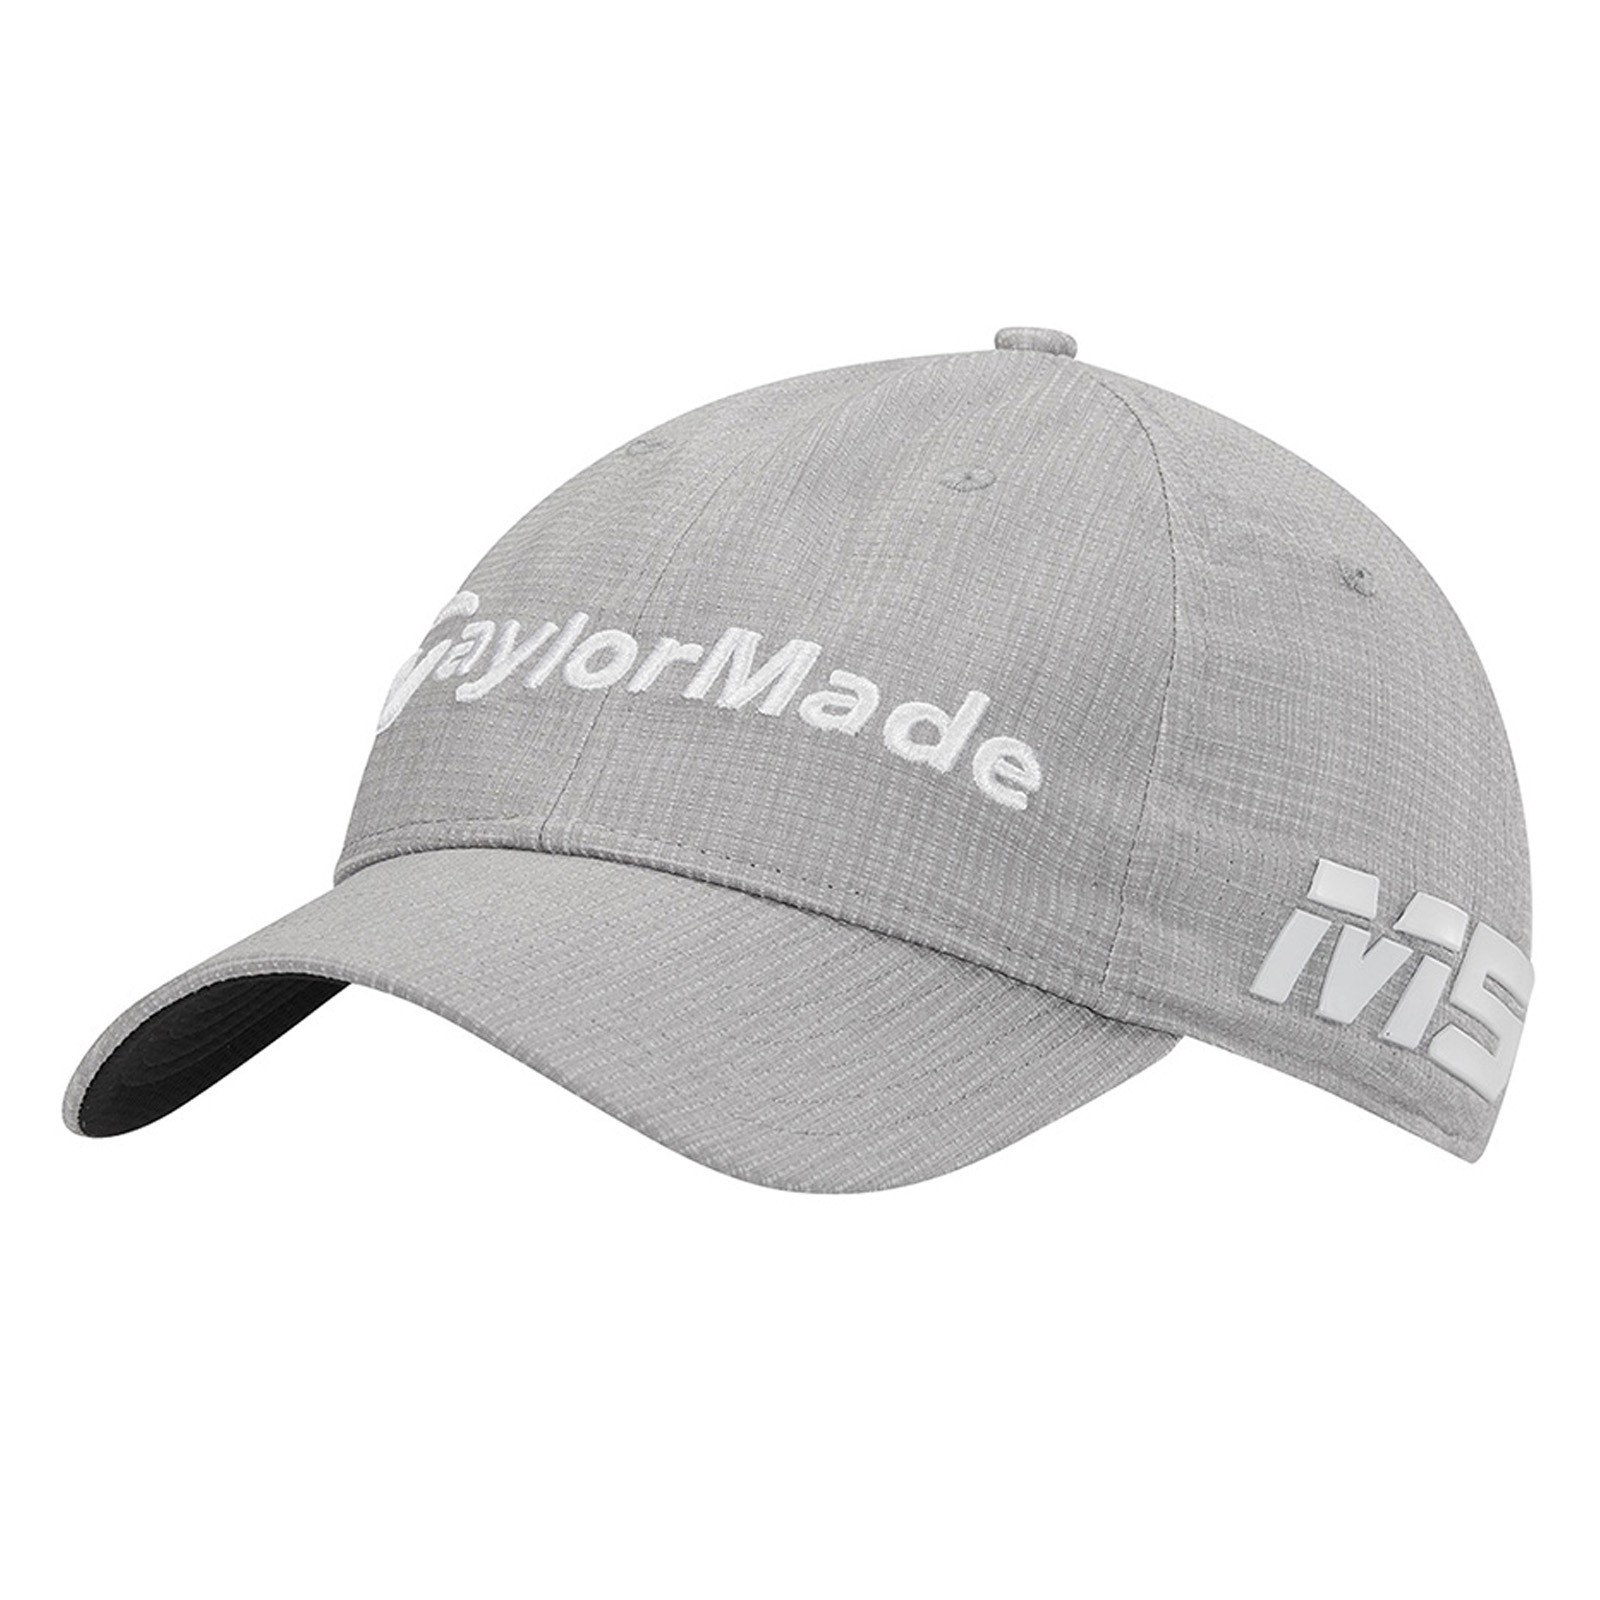 838987b23 Taylormade Litetech Tour Caps